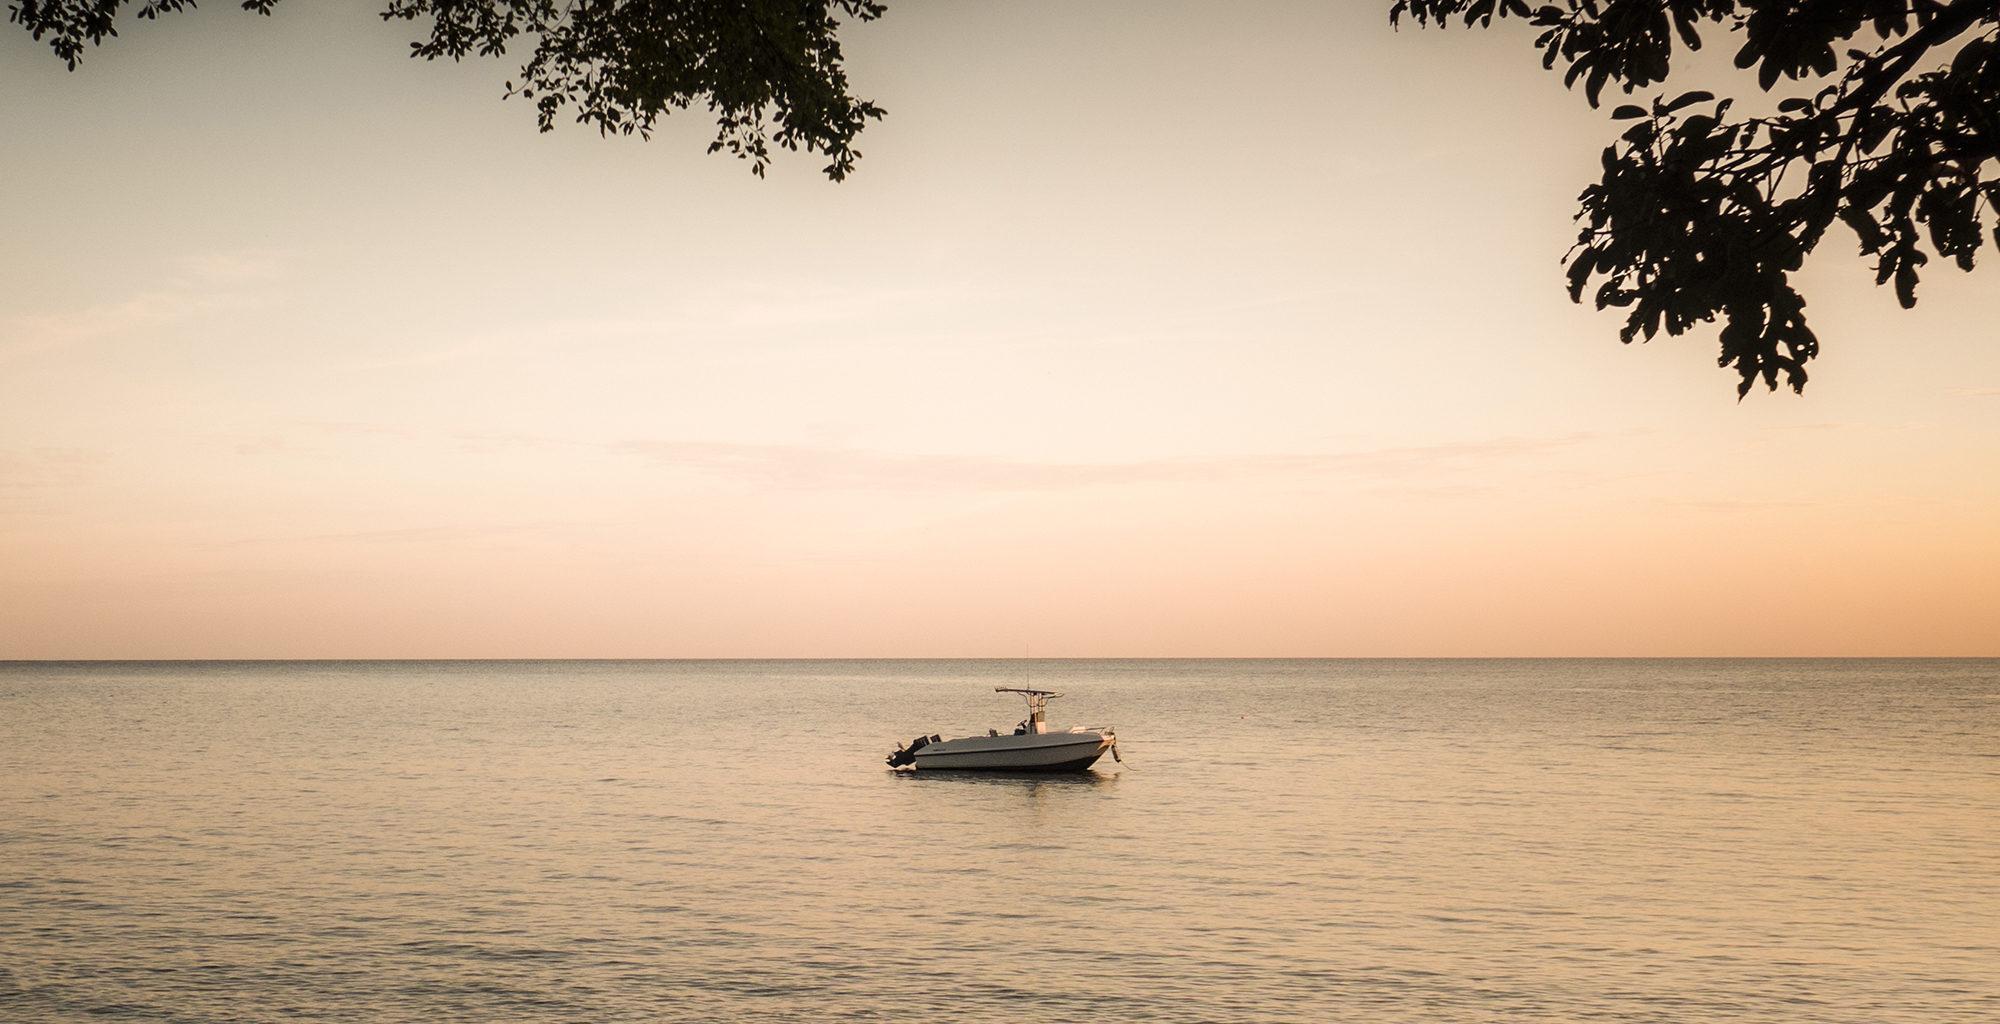 Tanzania-Rubondo-Island-Sunrise-Beach